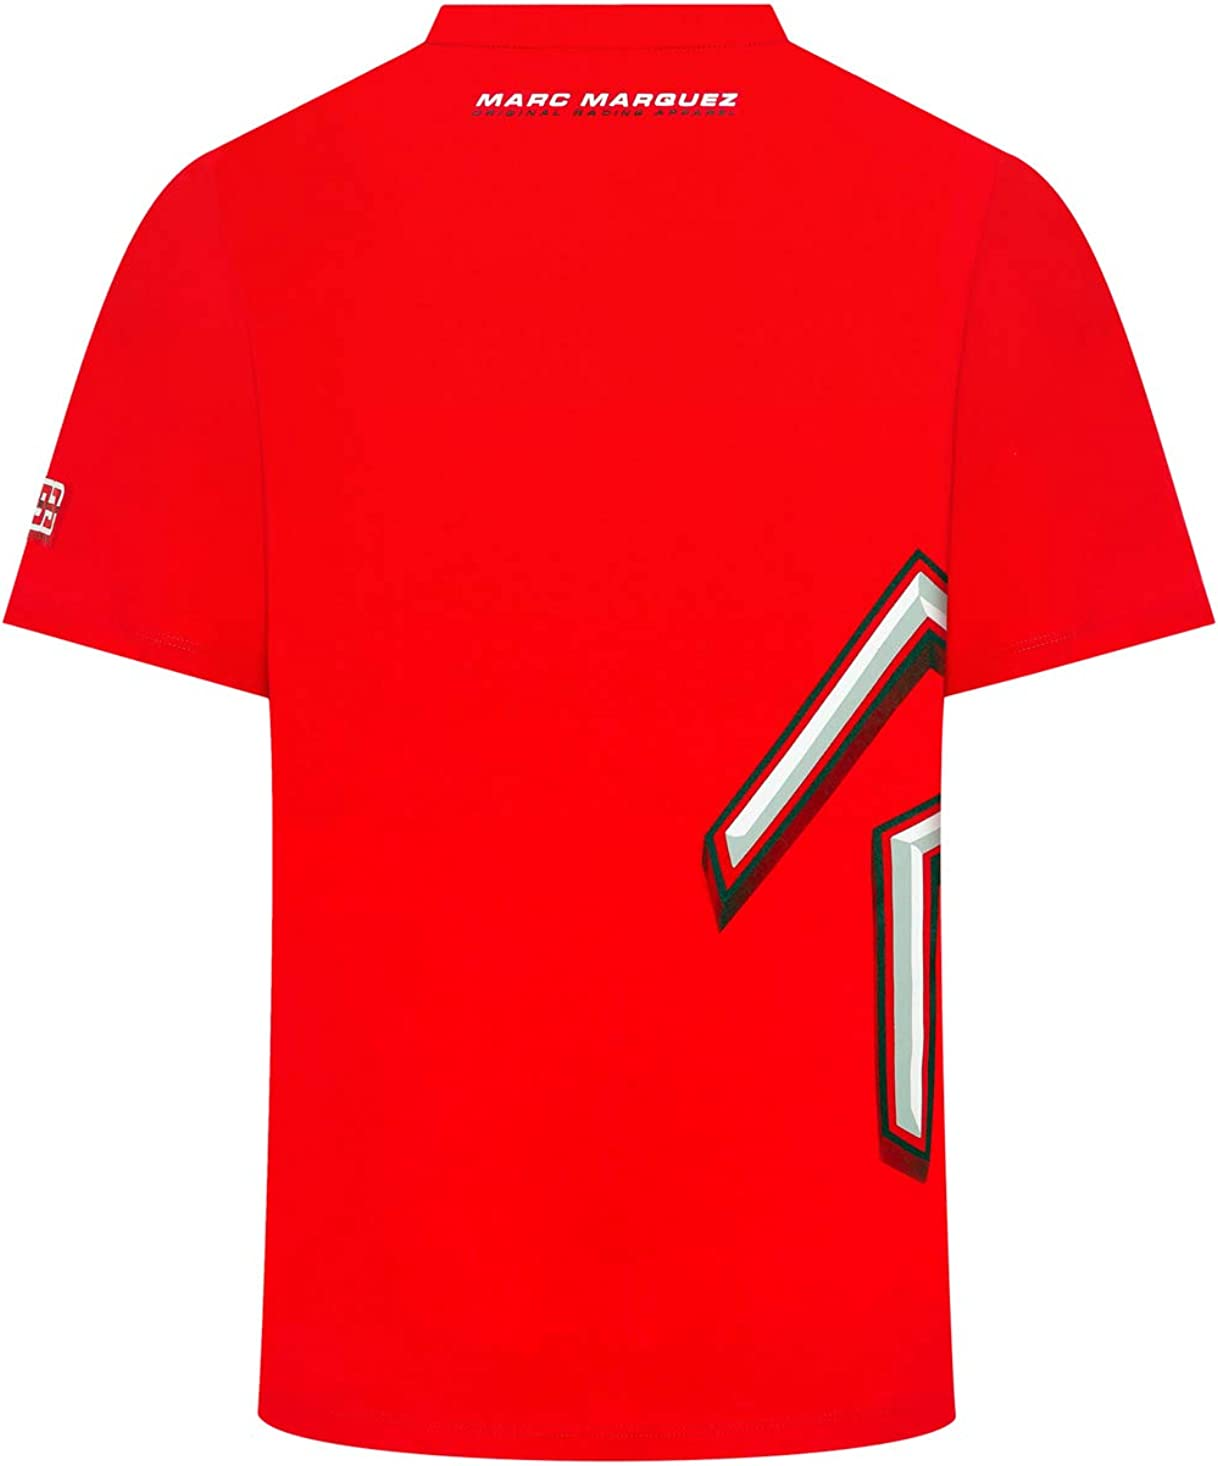 M&Ms Camiseta de Marc Marquez - Hormiga Grande 93 - Rojo - L ...